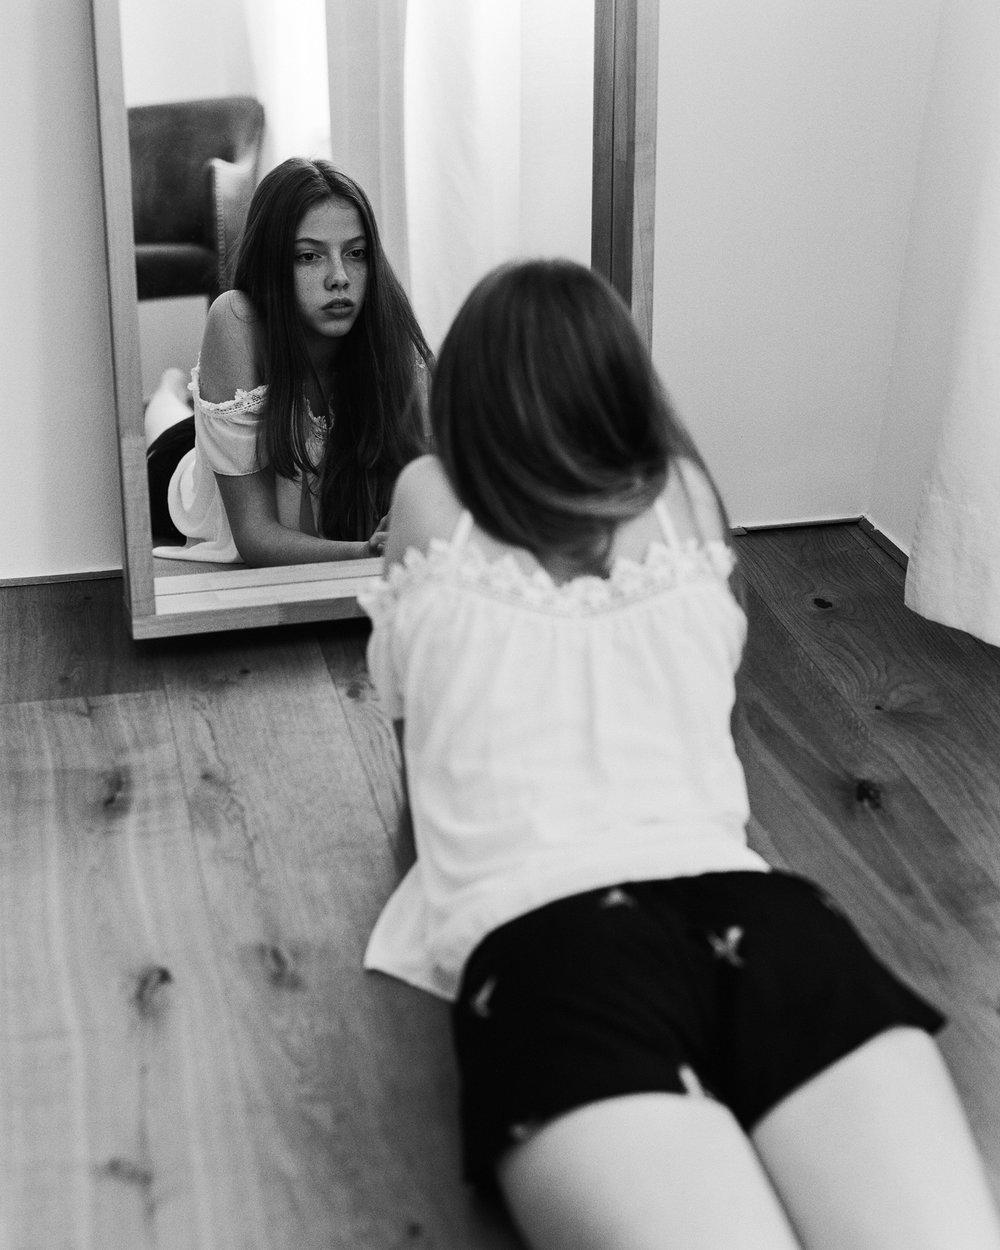 Jule_24_02_2018_Kodak_Tri-x_5_10.jpg